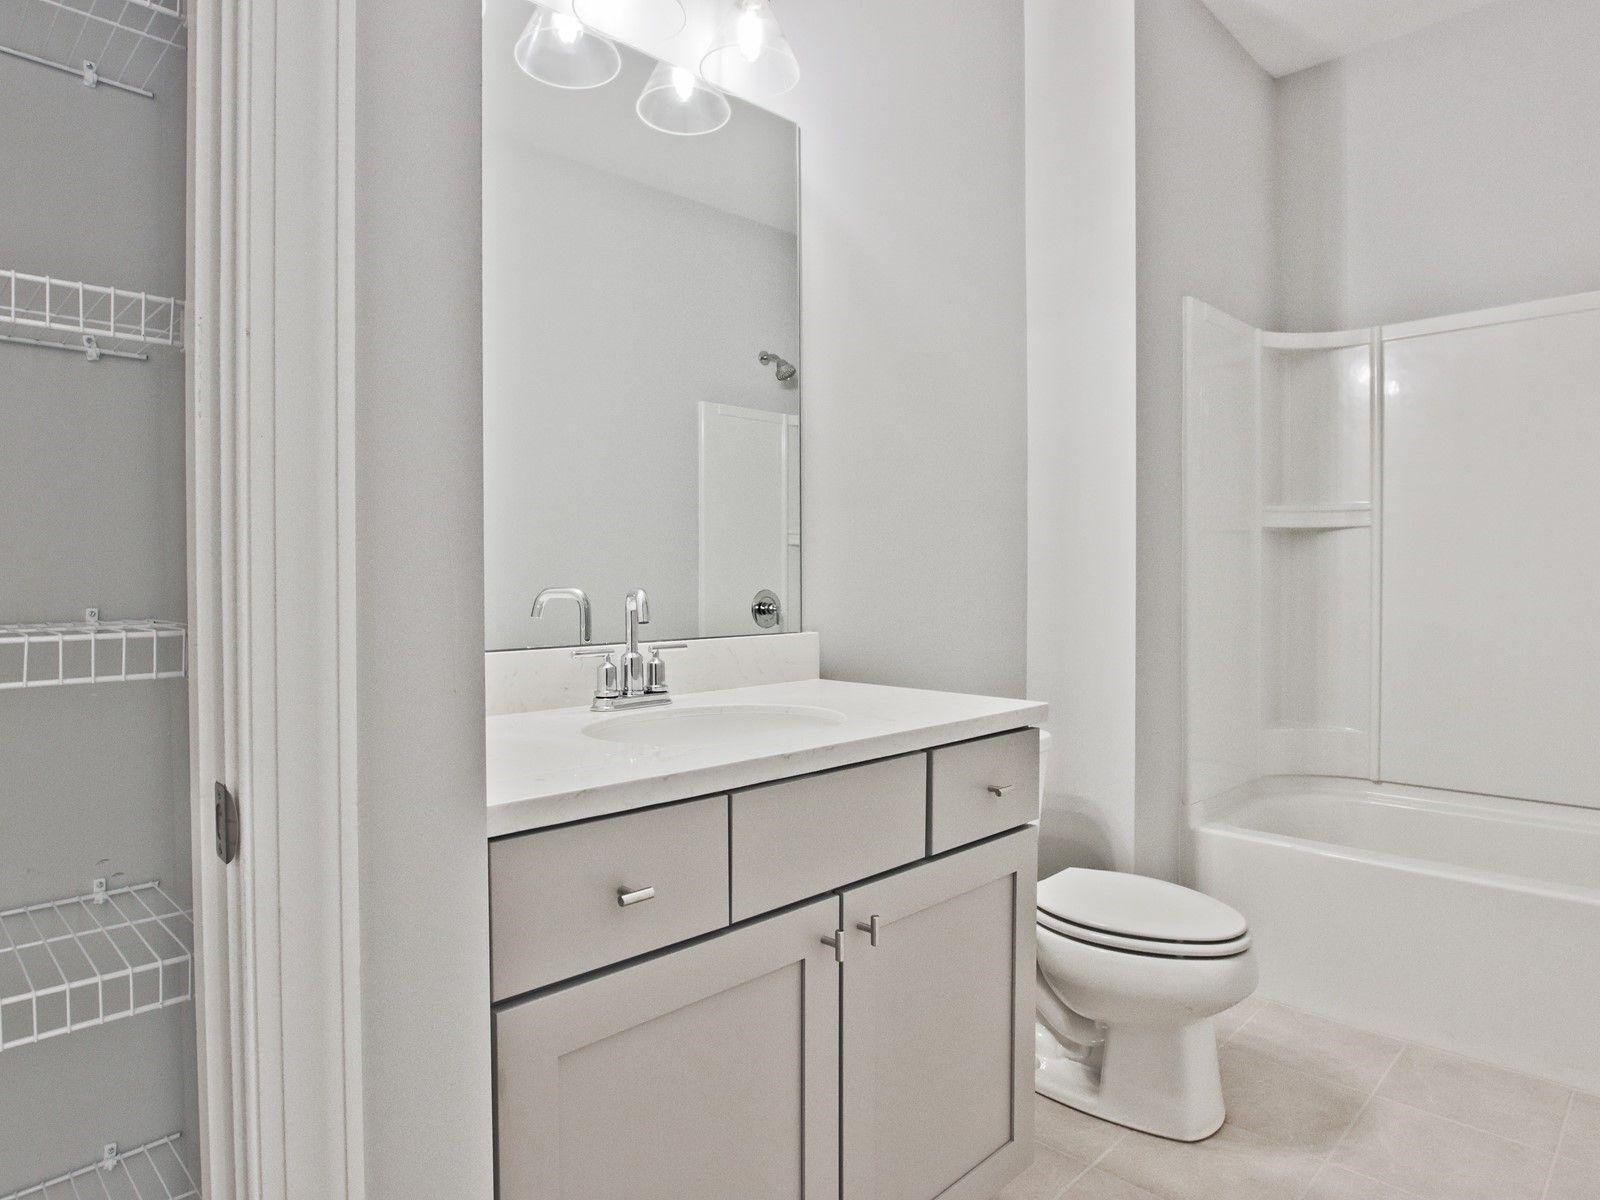 Bathroom featured in the Pavarotti By Ashton Woods in Atlanta, GA